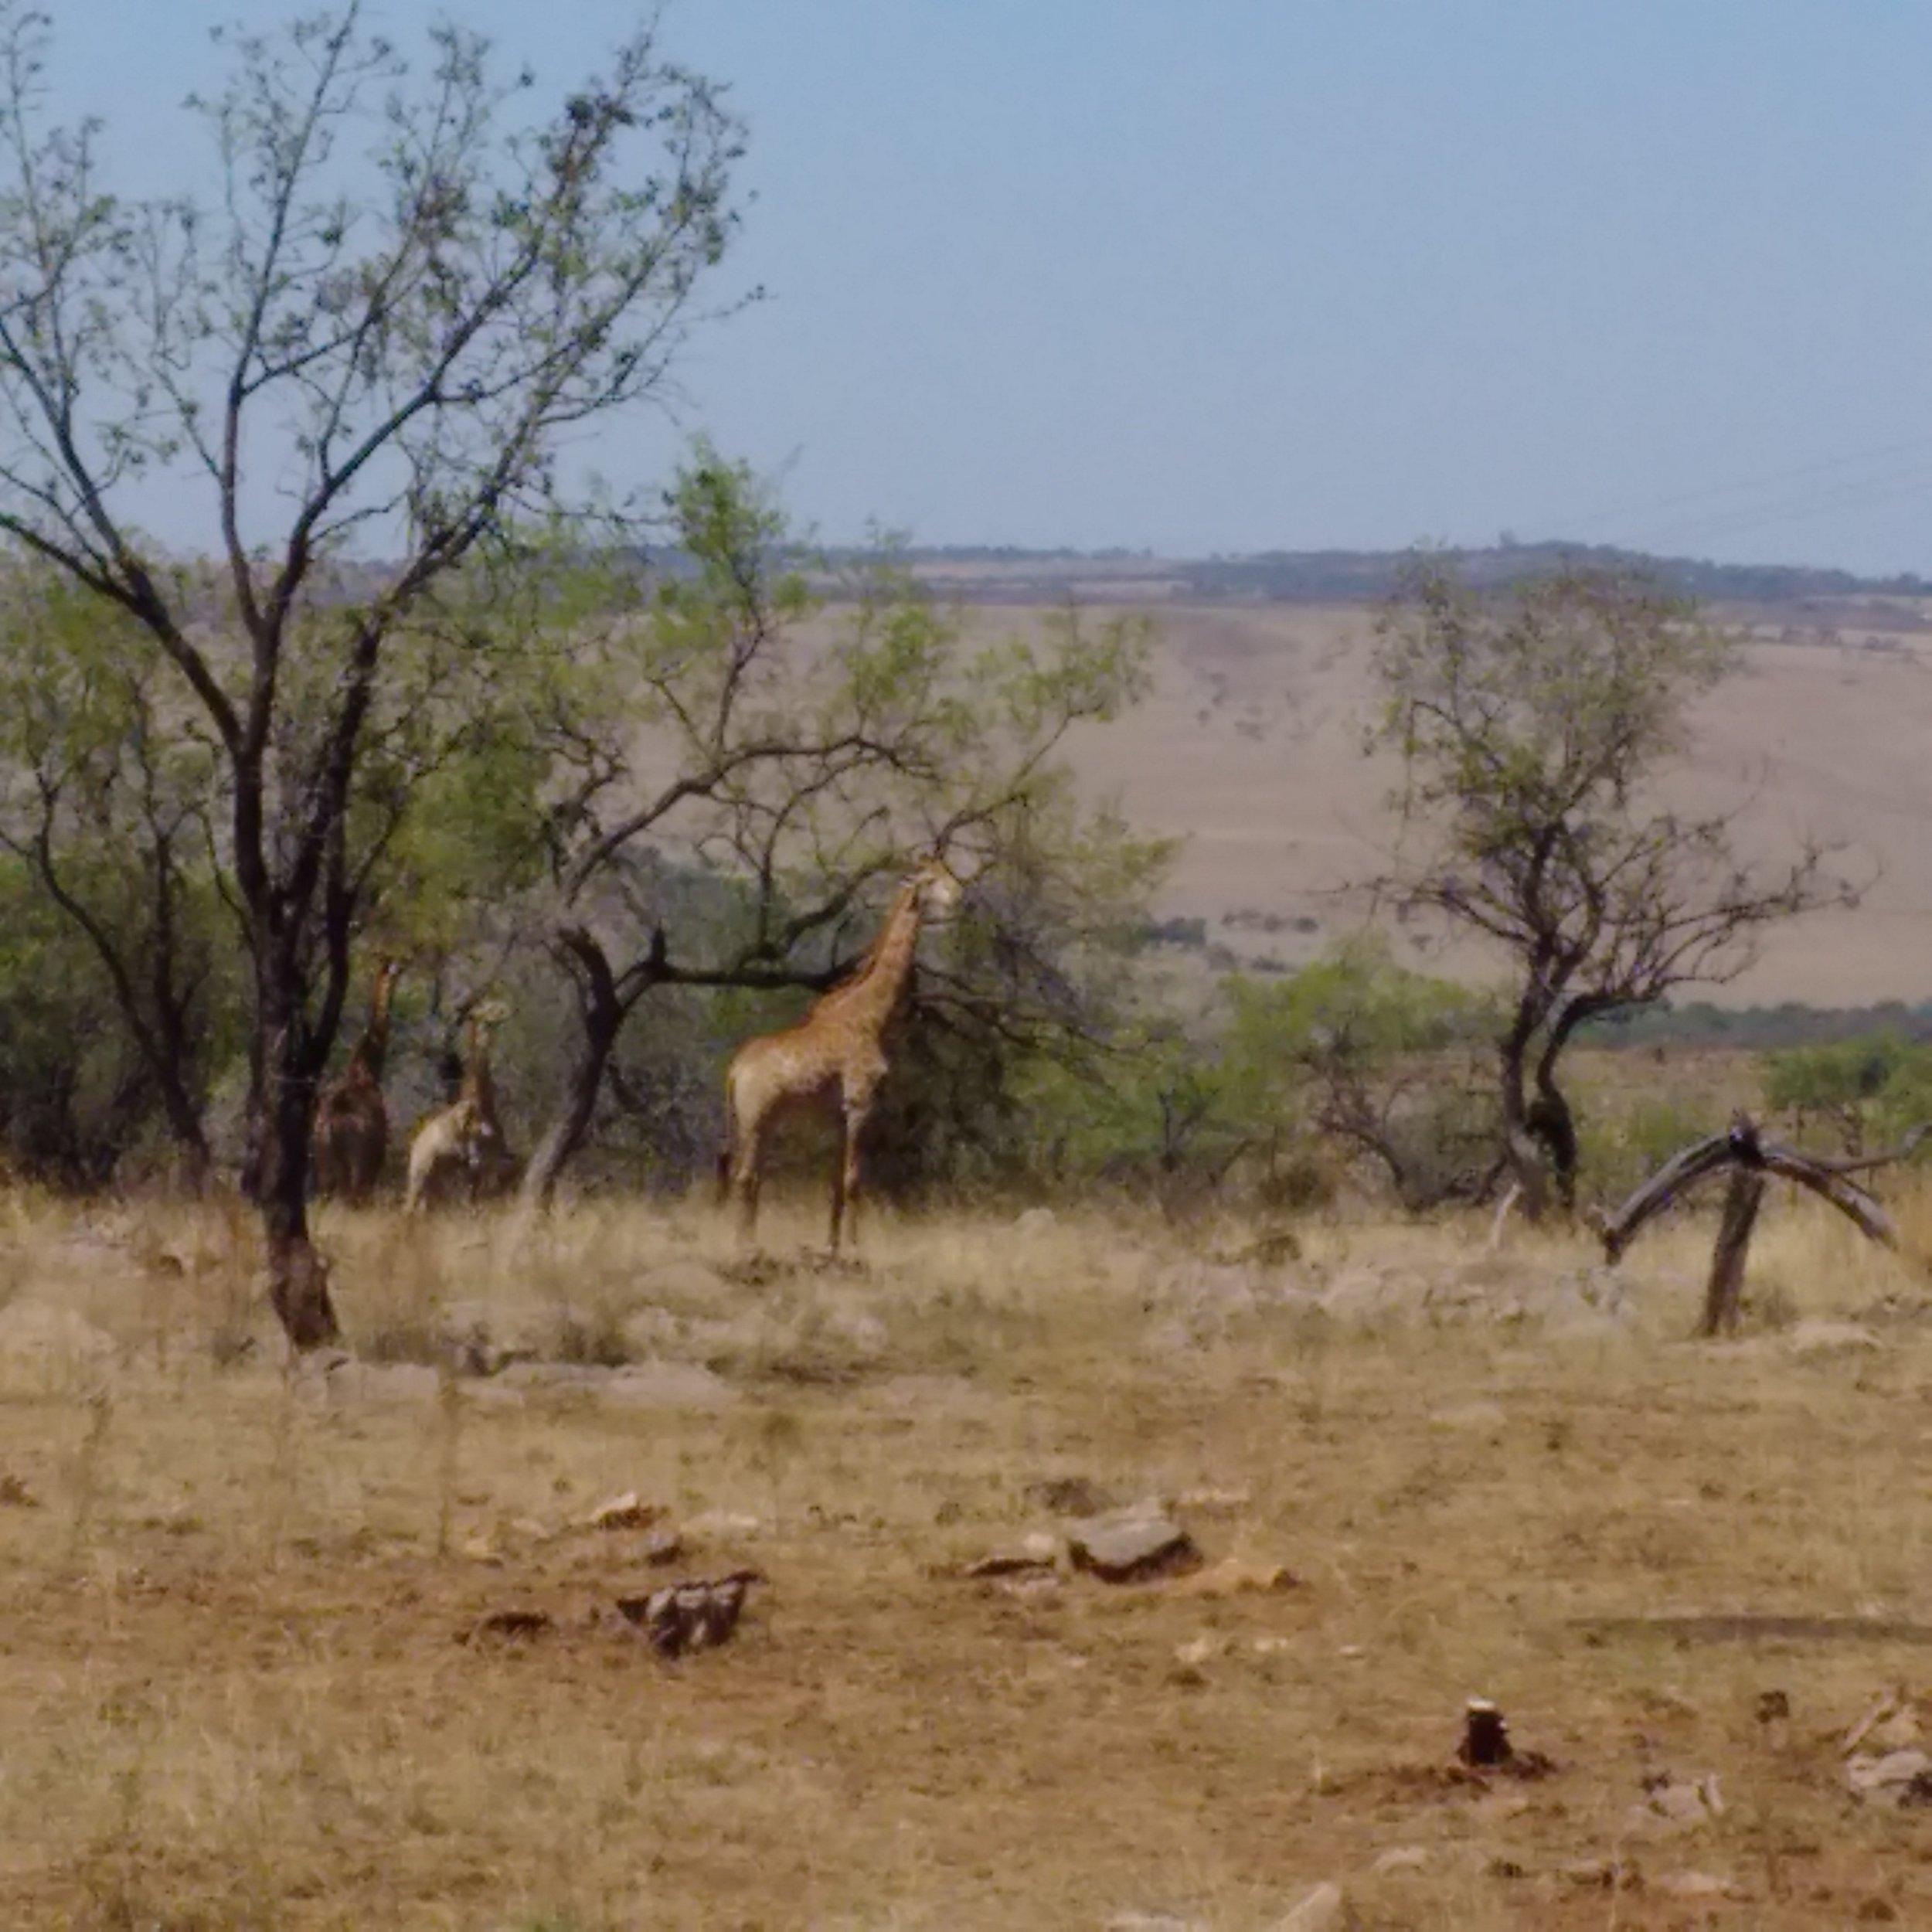 Lion and Safari Park   Giraffs